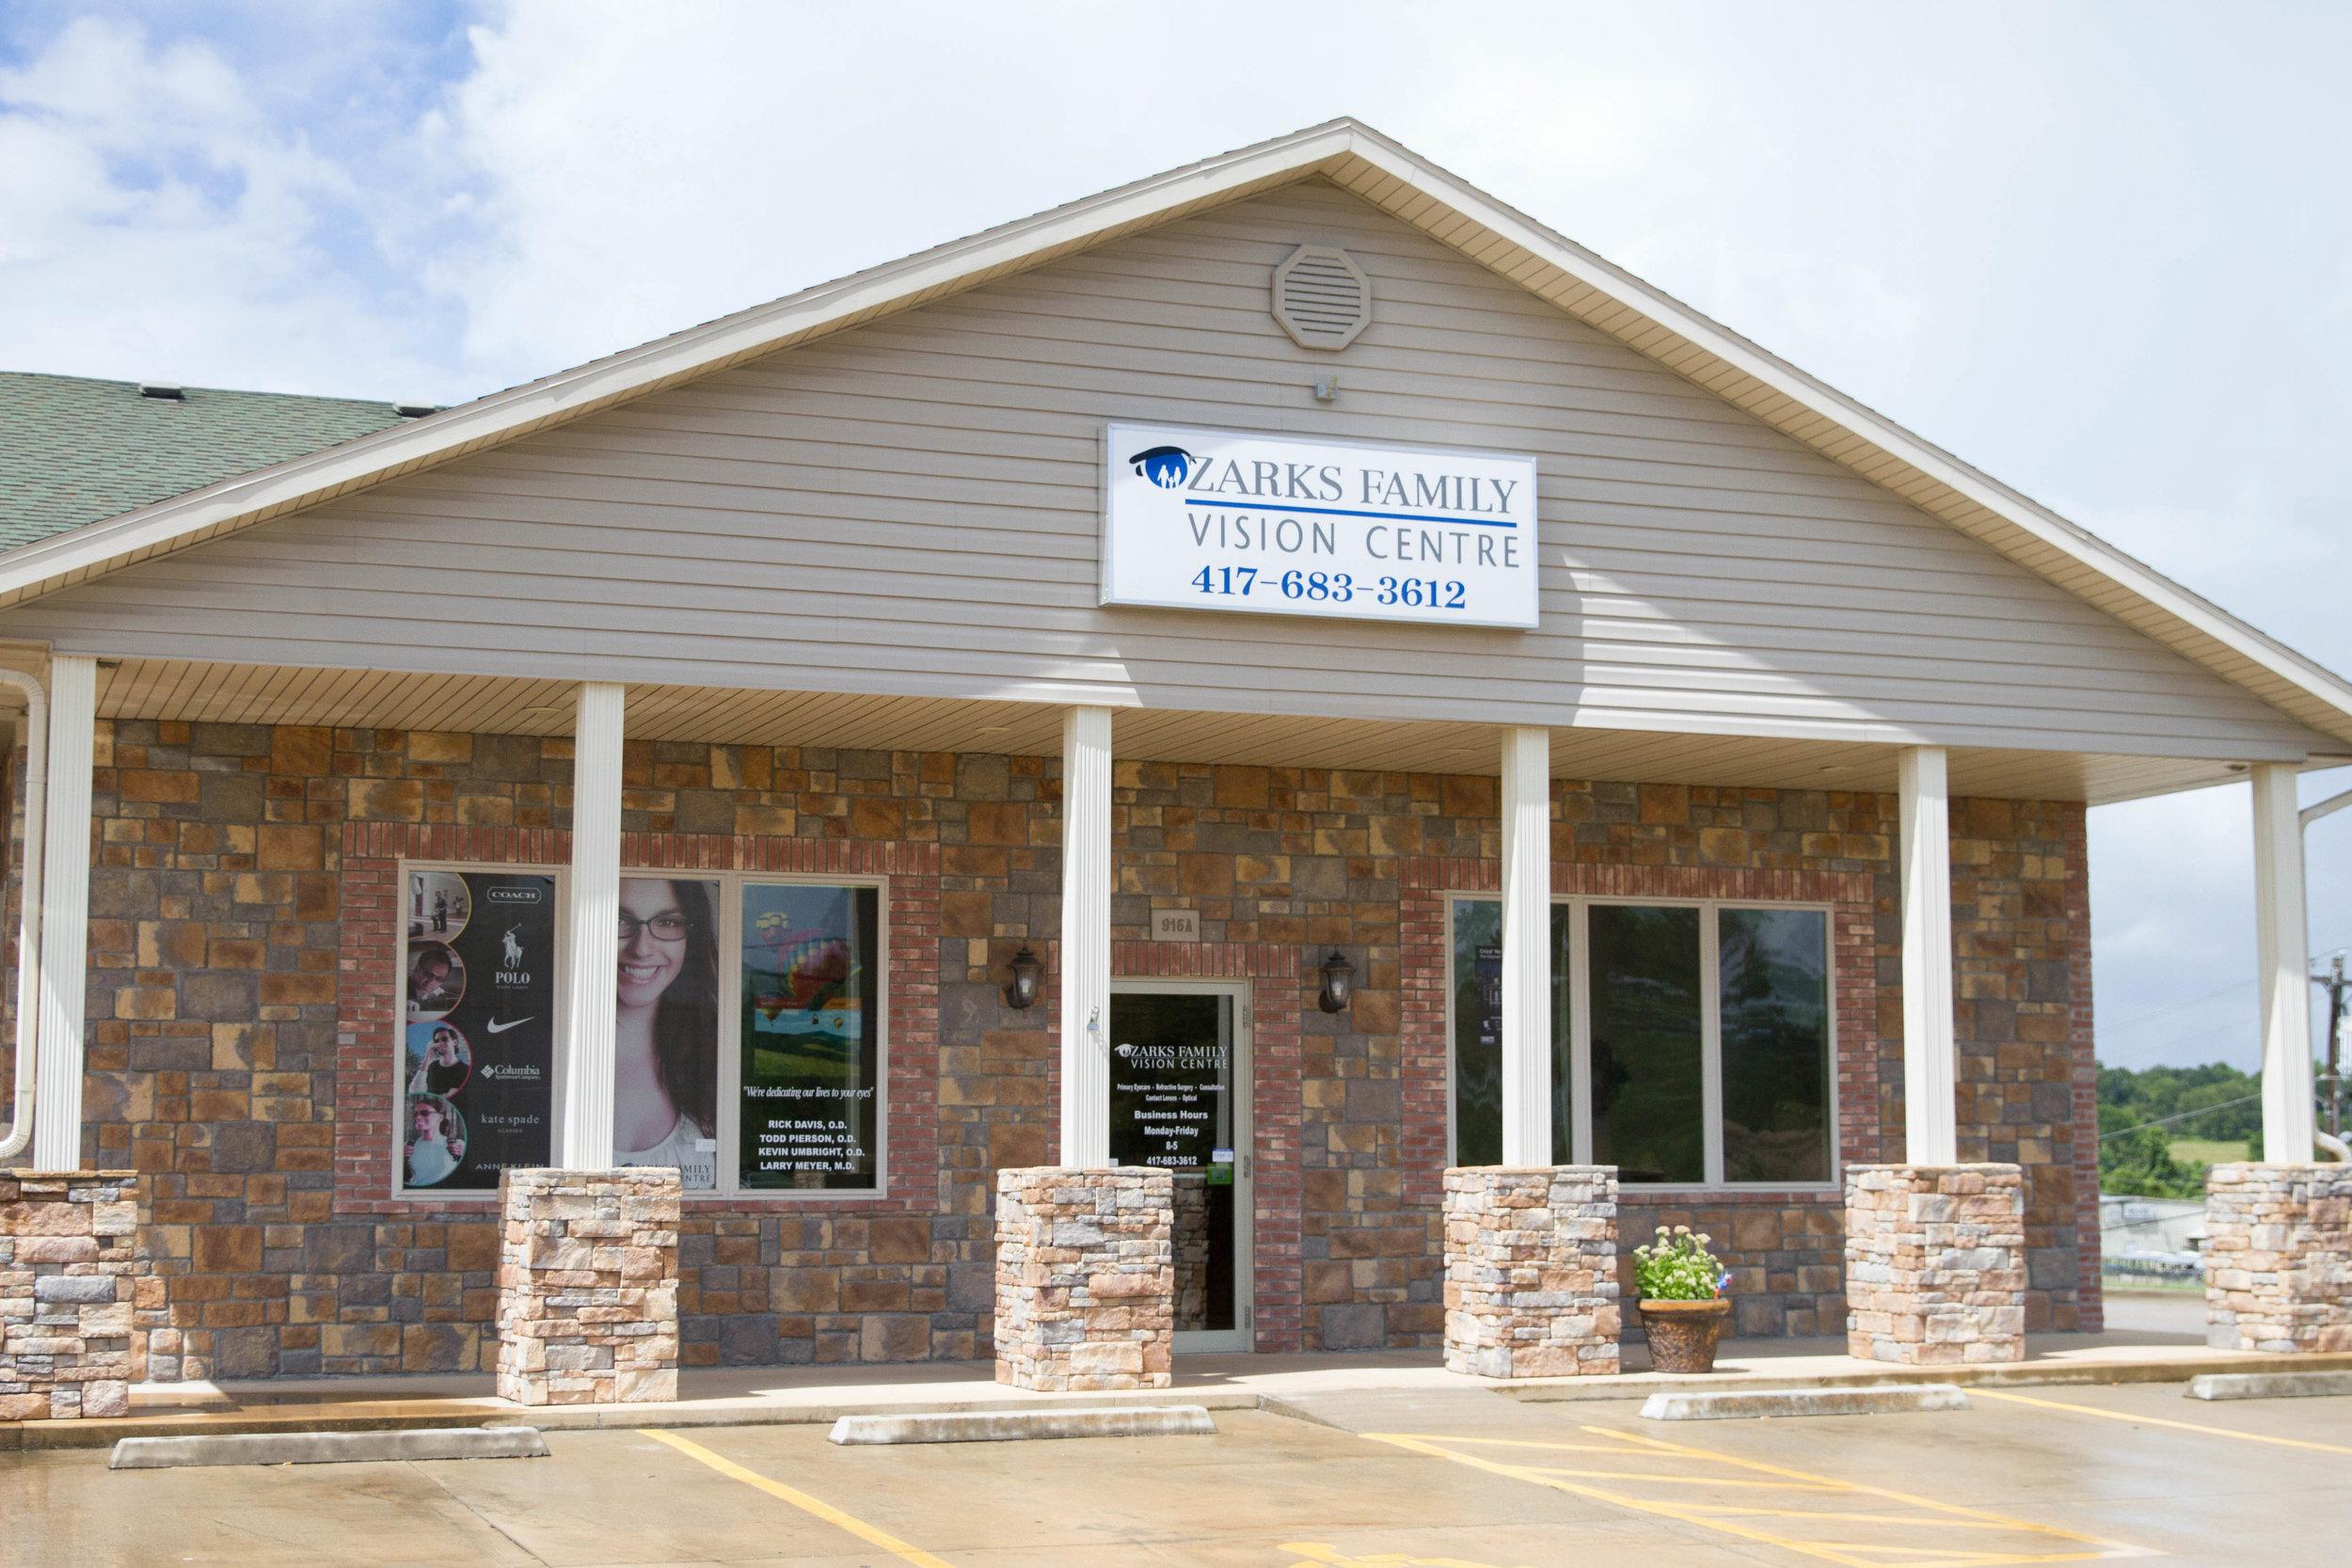 Ozark Family Vision Centre - Ava